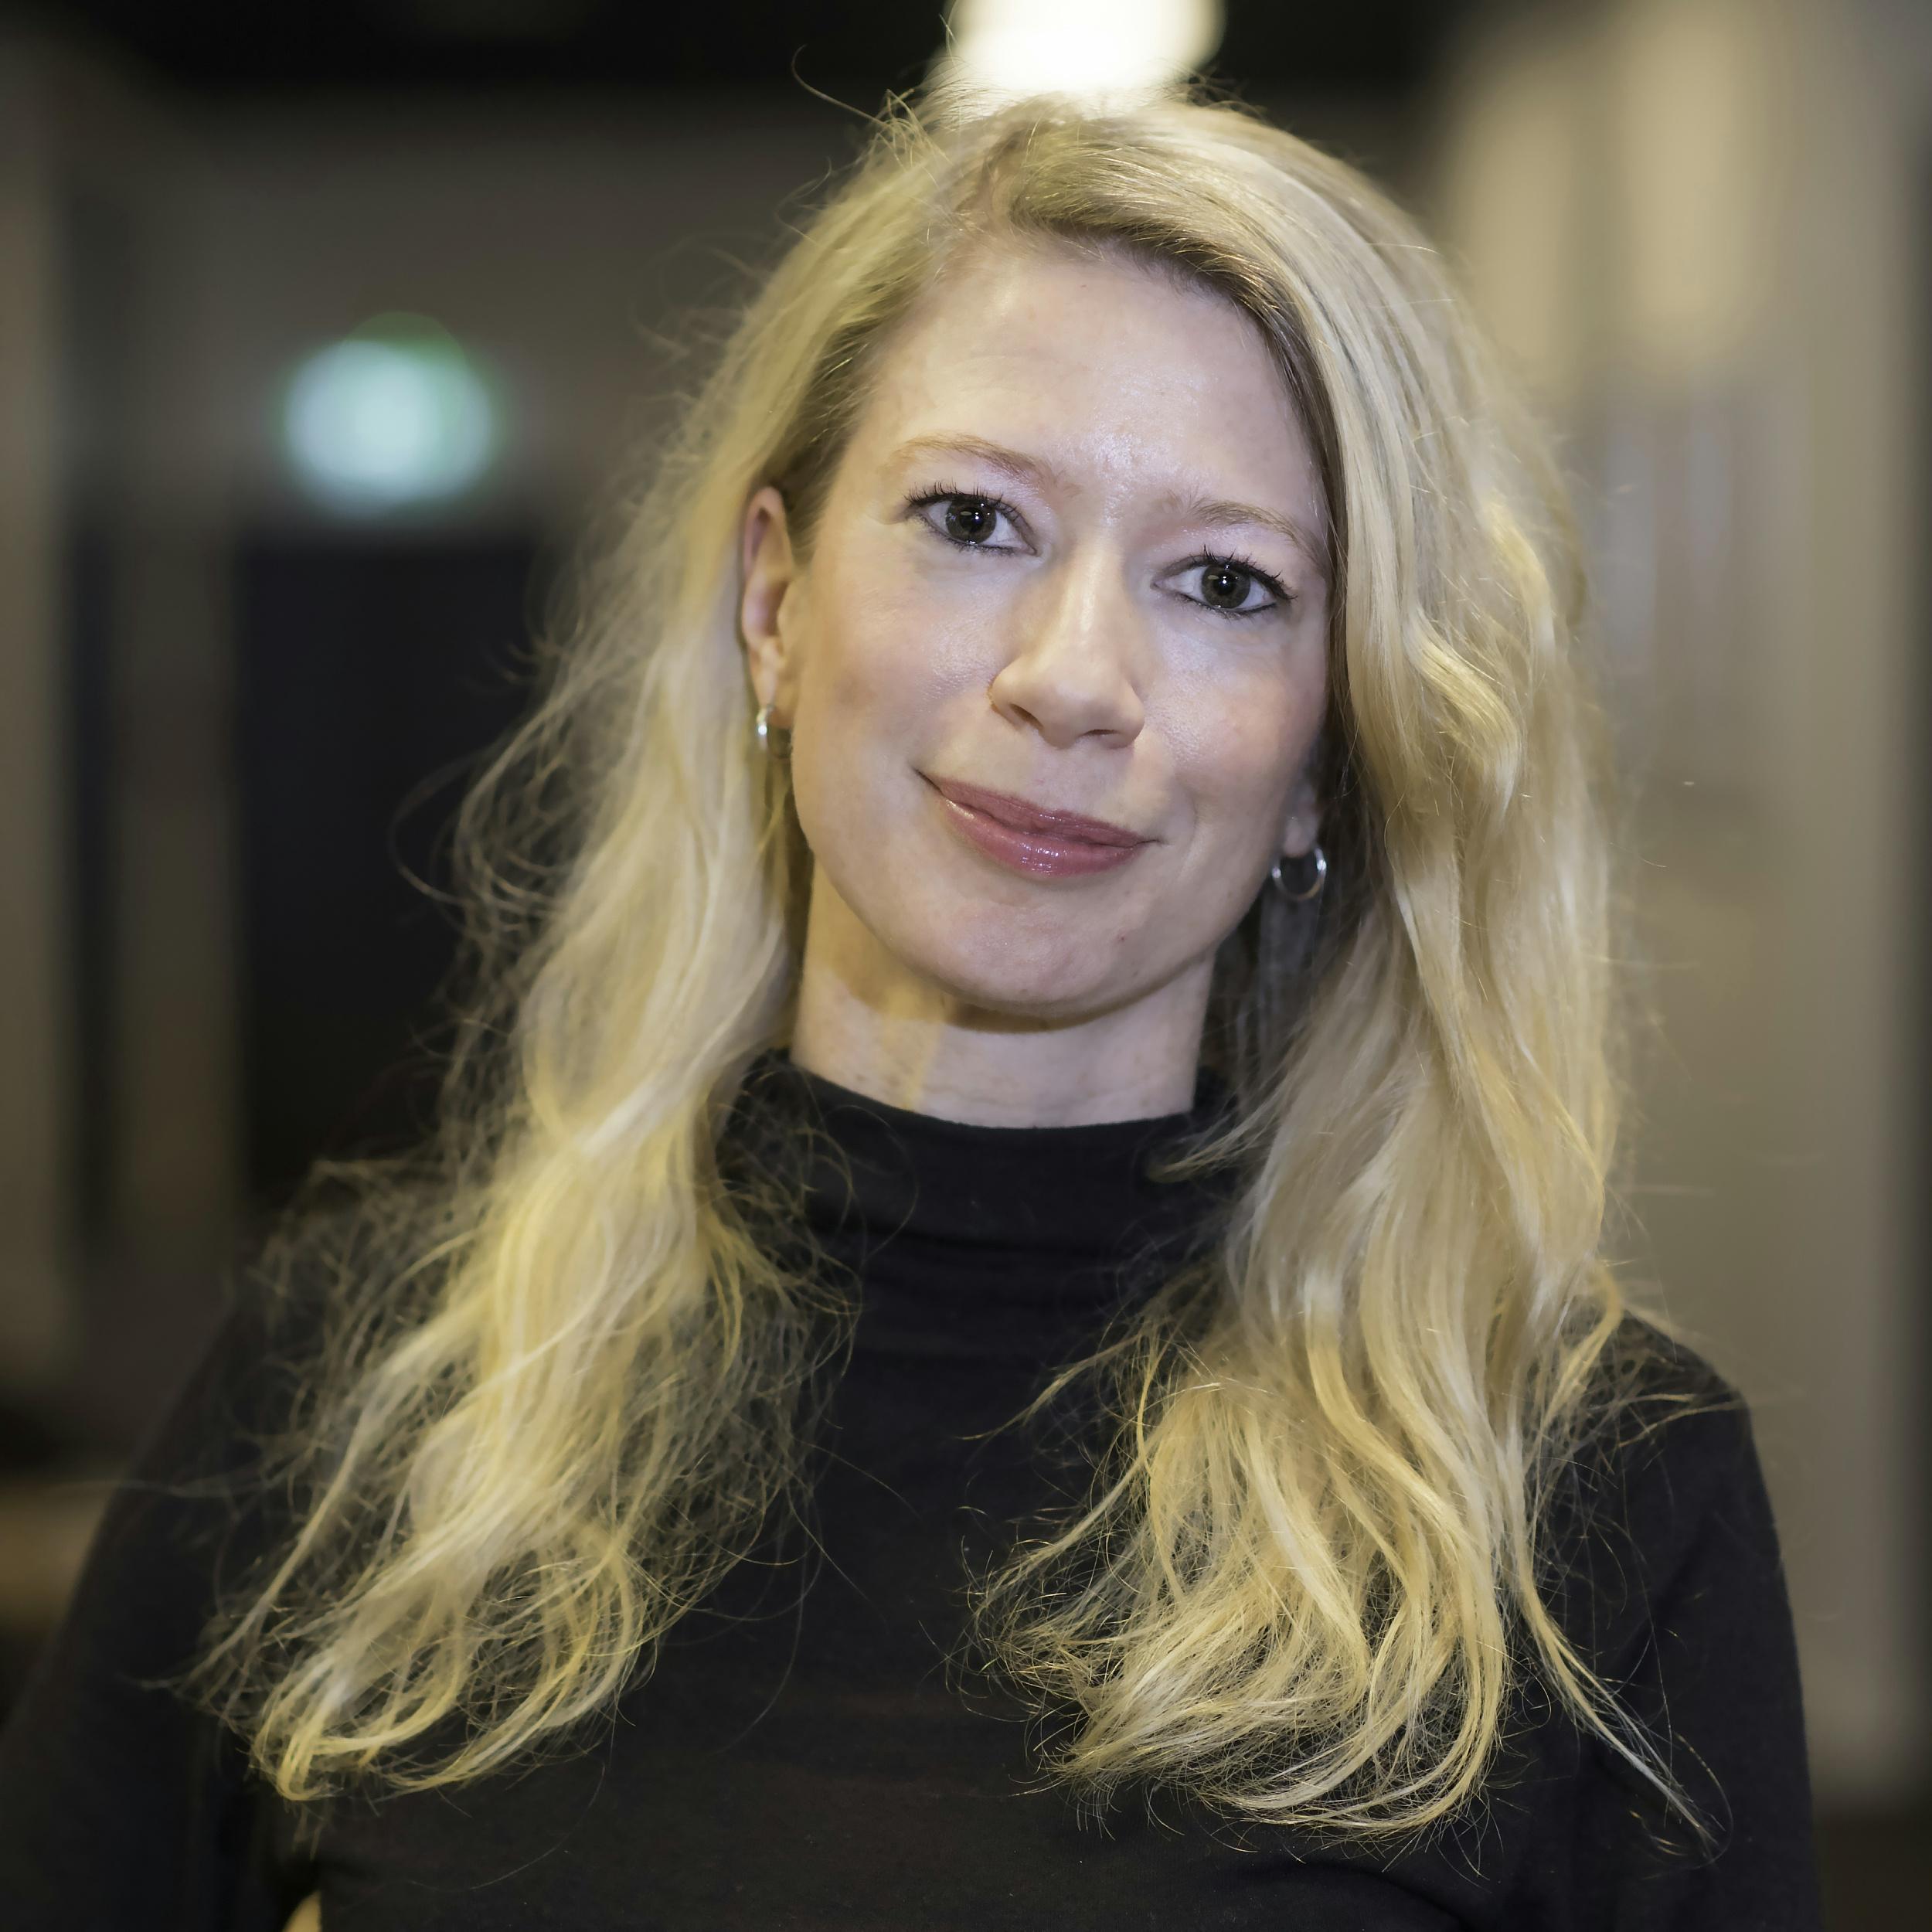 Linda Wahlmann Olsen#Seniorrådgiver# Prosjektleder Skole#lwo@kulturtanken.no#Tlf. 970 46 011